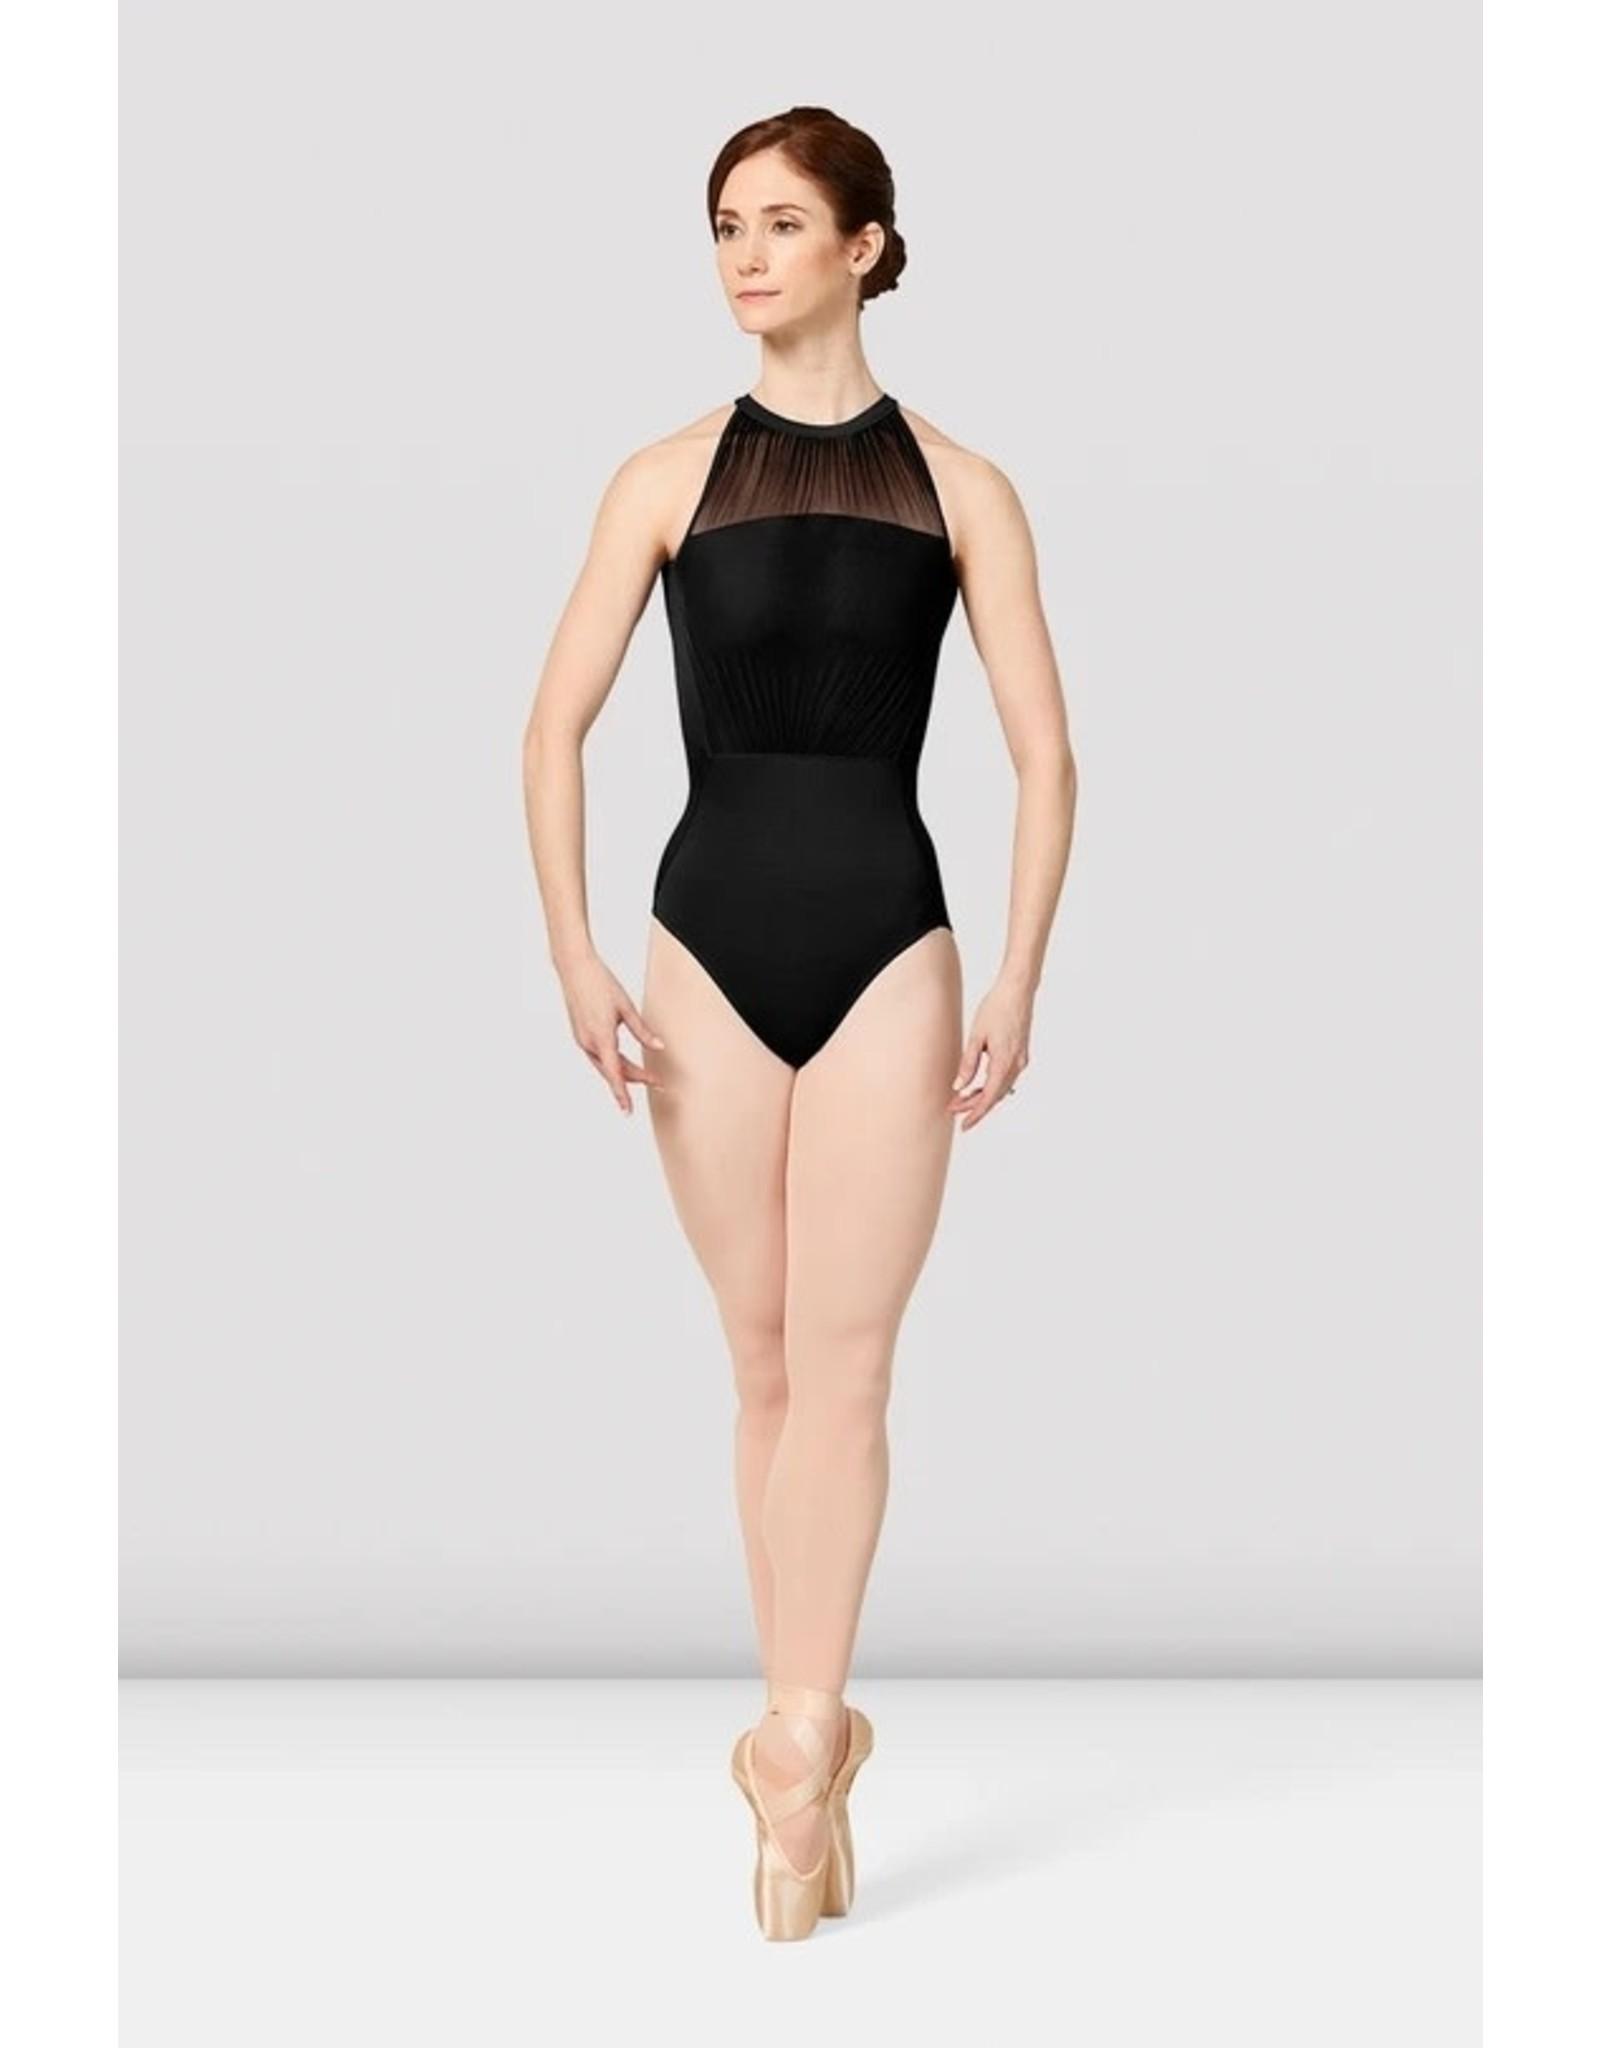 Mirella M8026LM Balletpakje high neck. open back